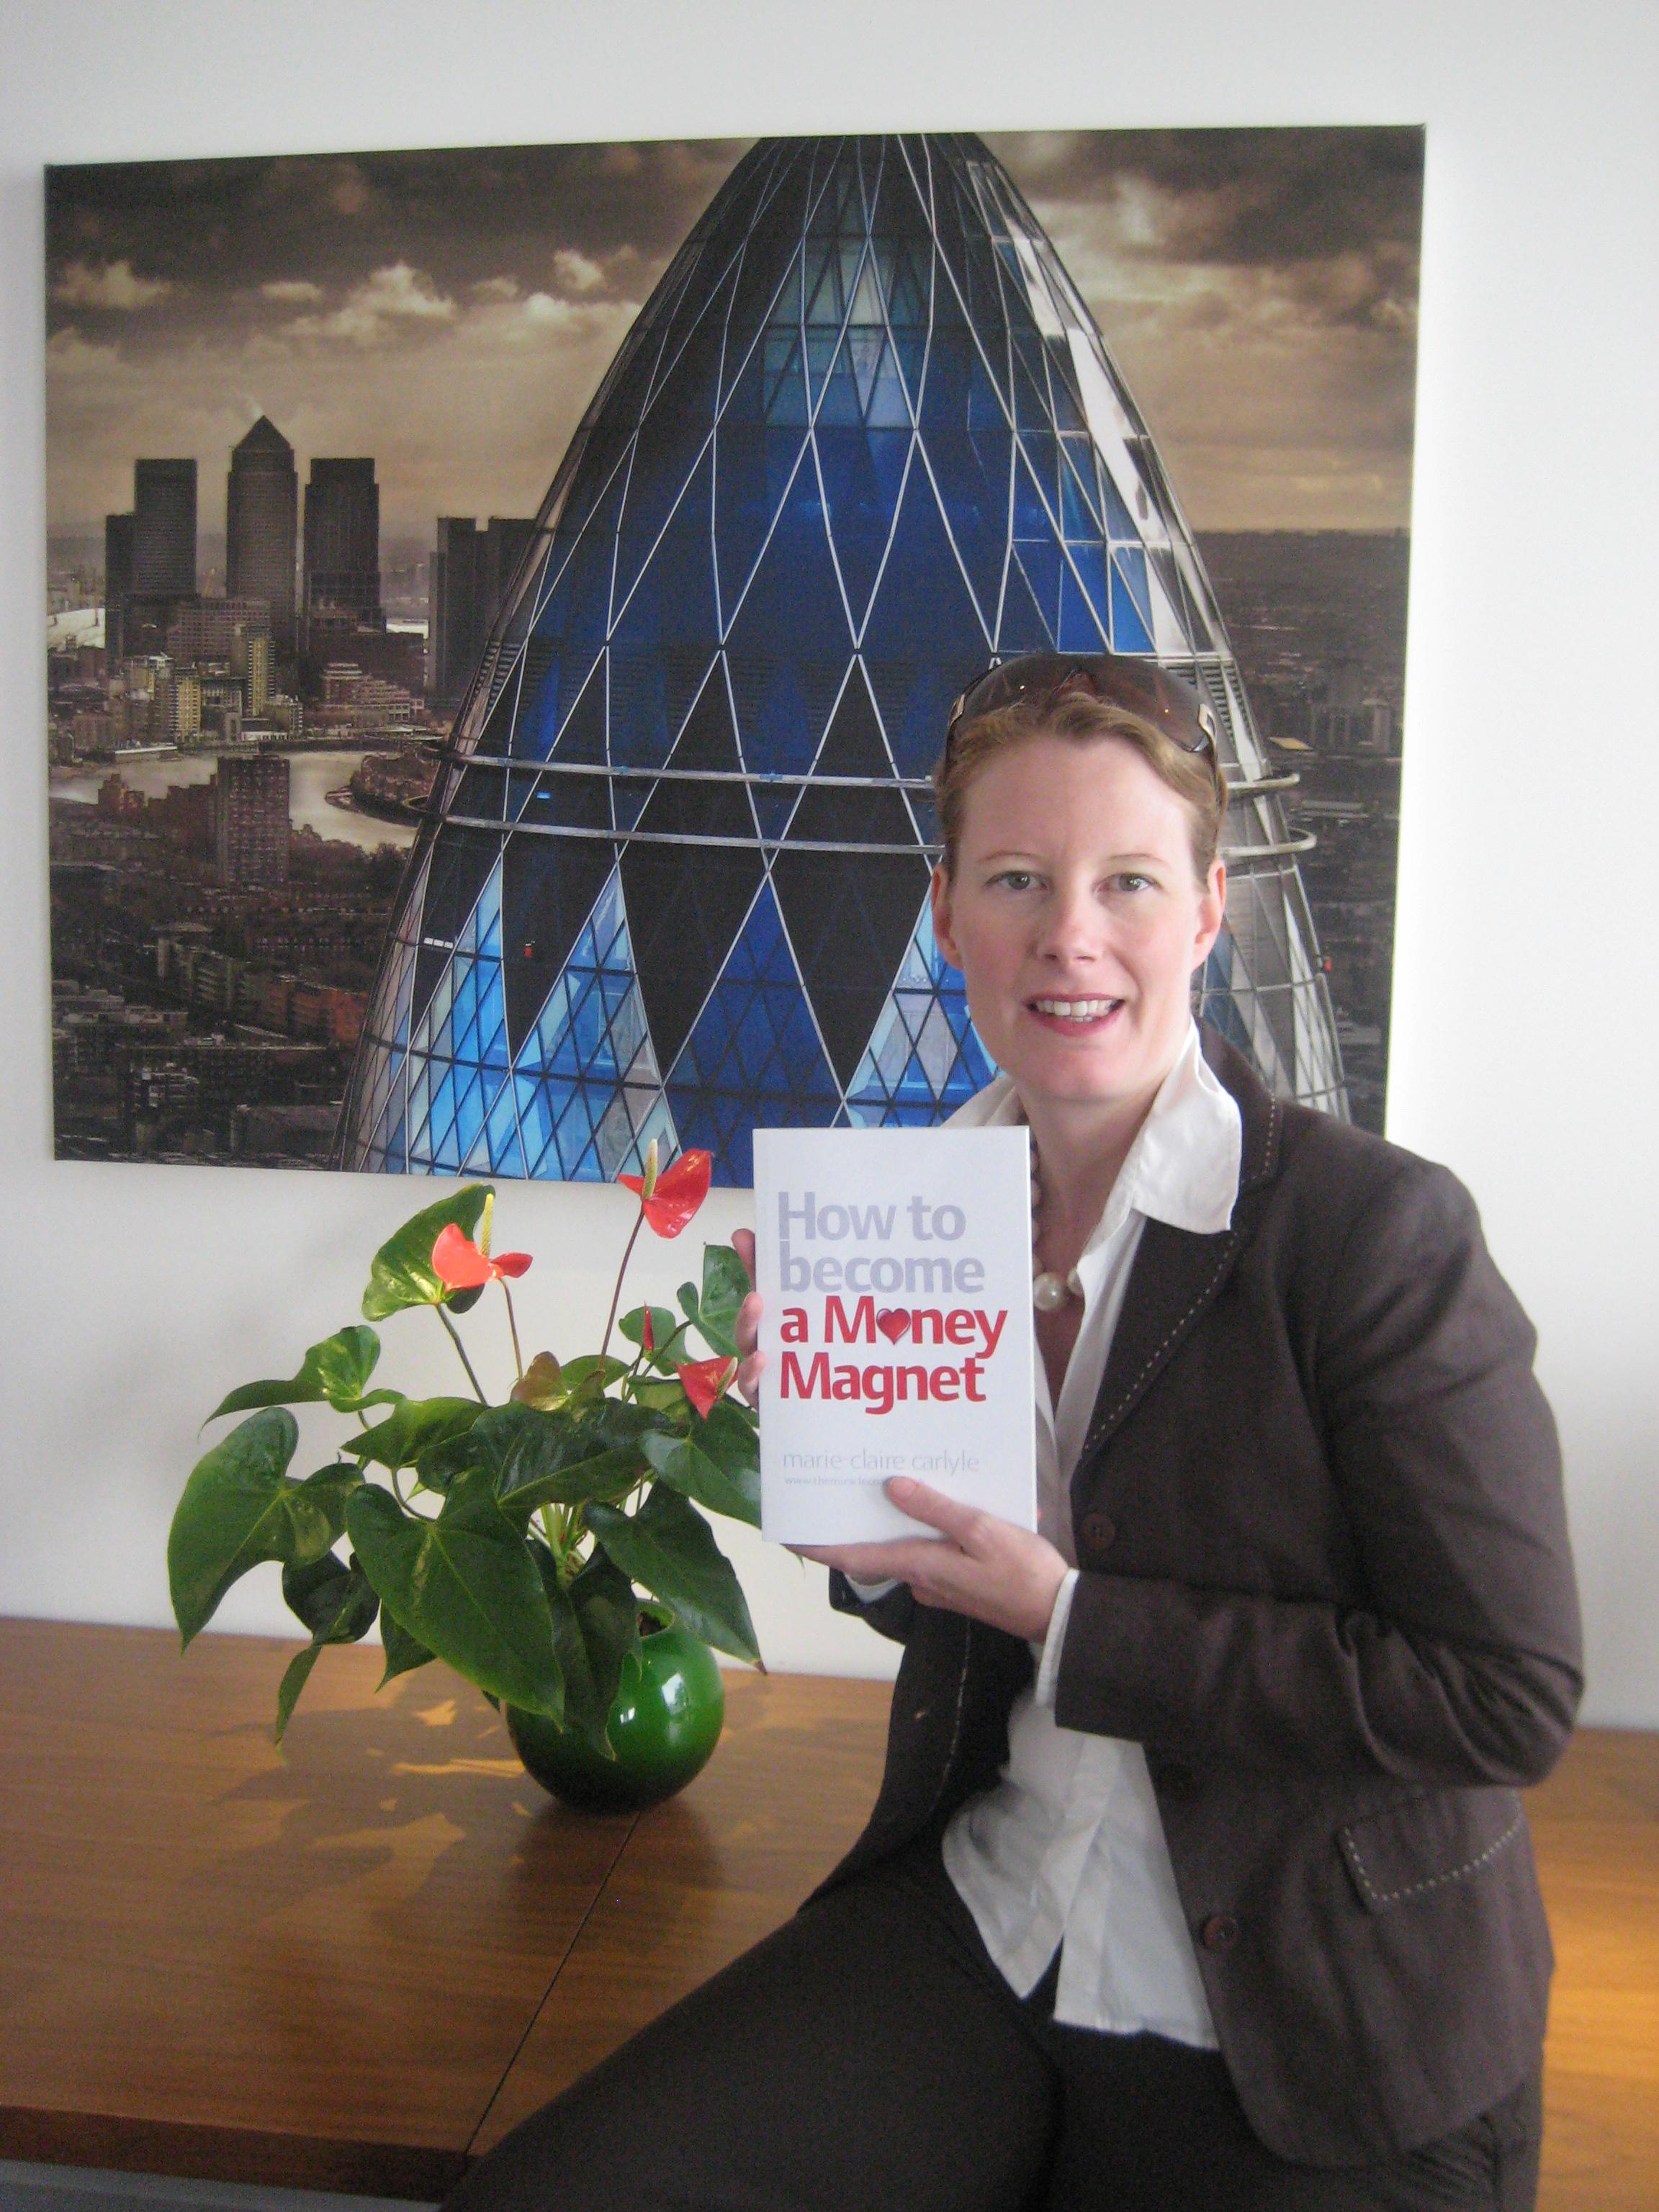 Amanda Steadman how to become a money magnet! - amanda steadman - author